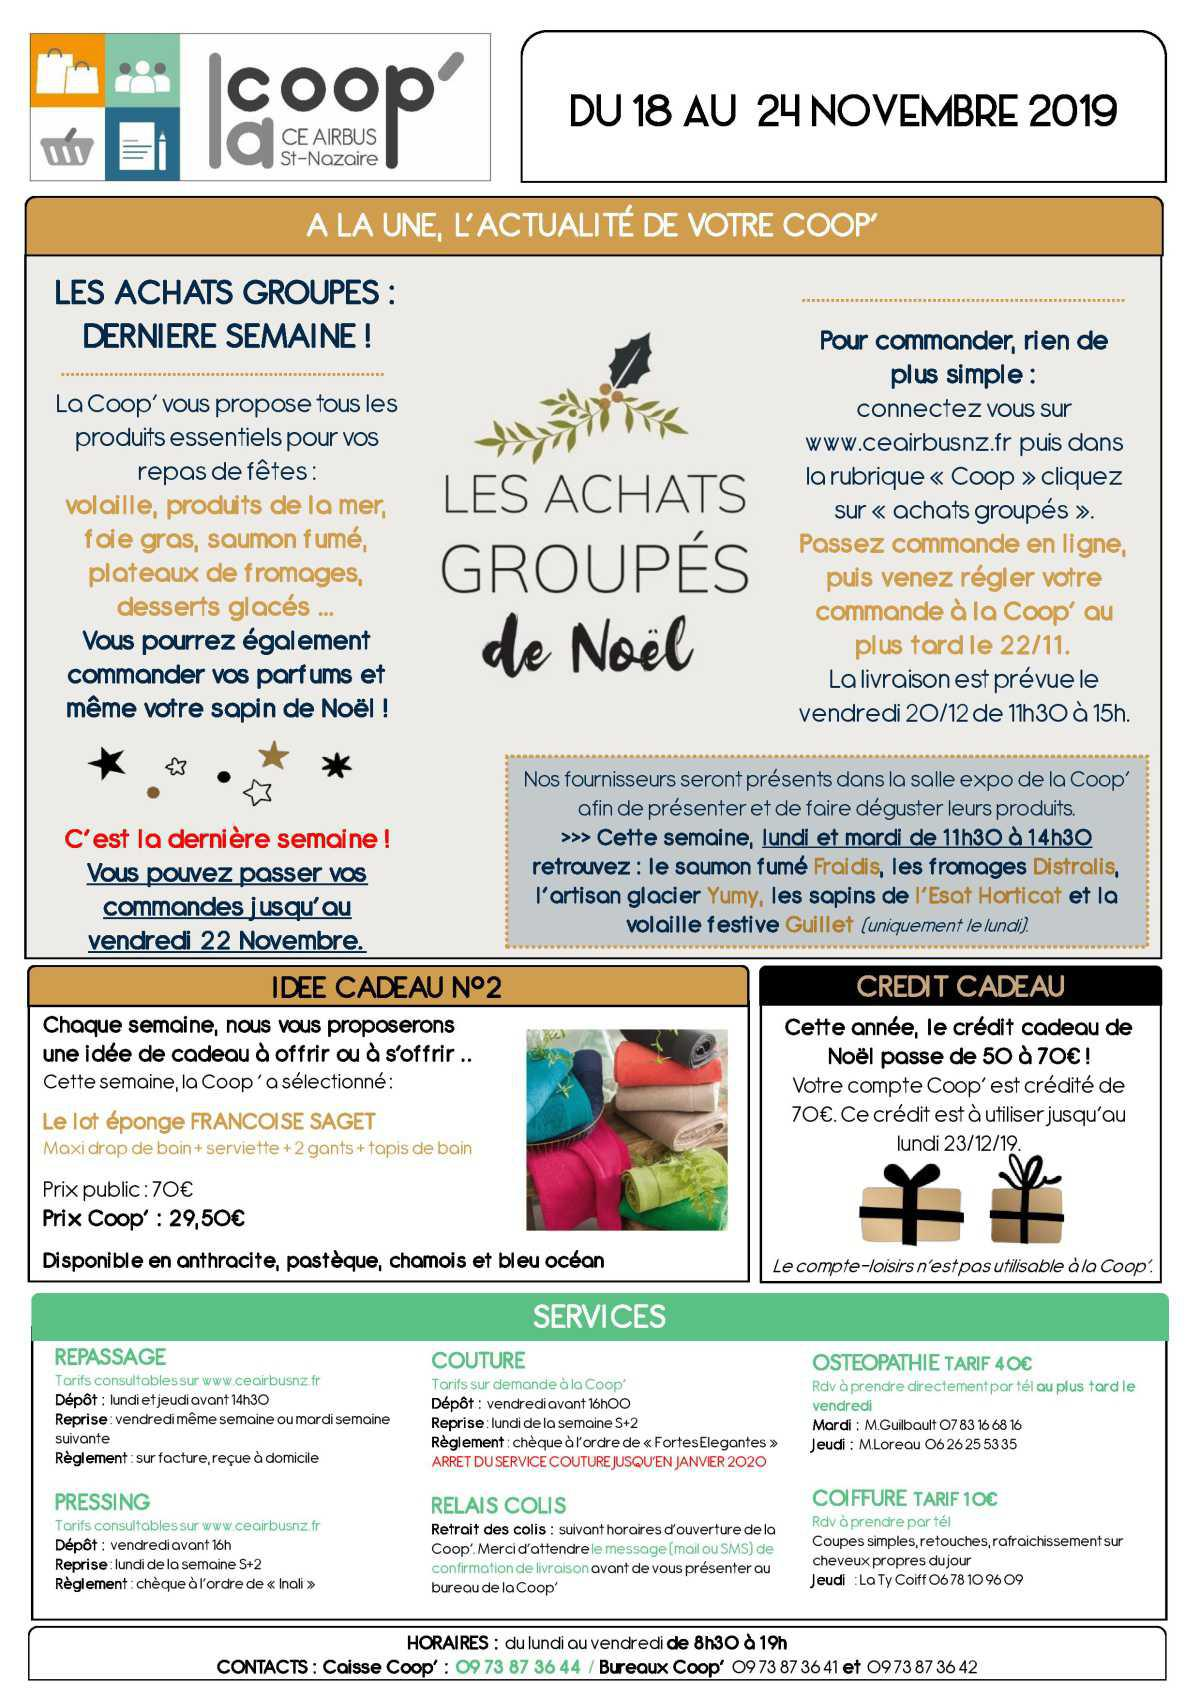 Infos CE / COOP semaine 47